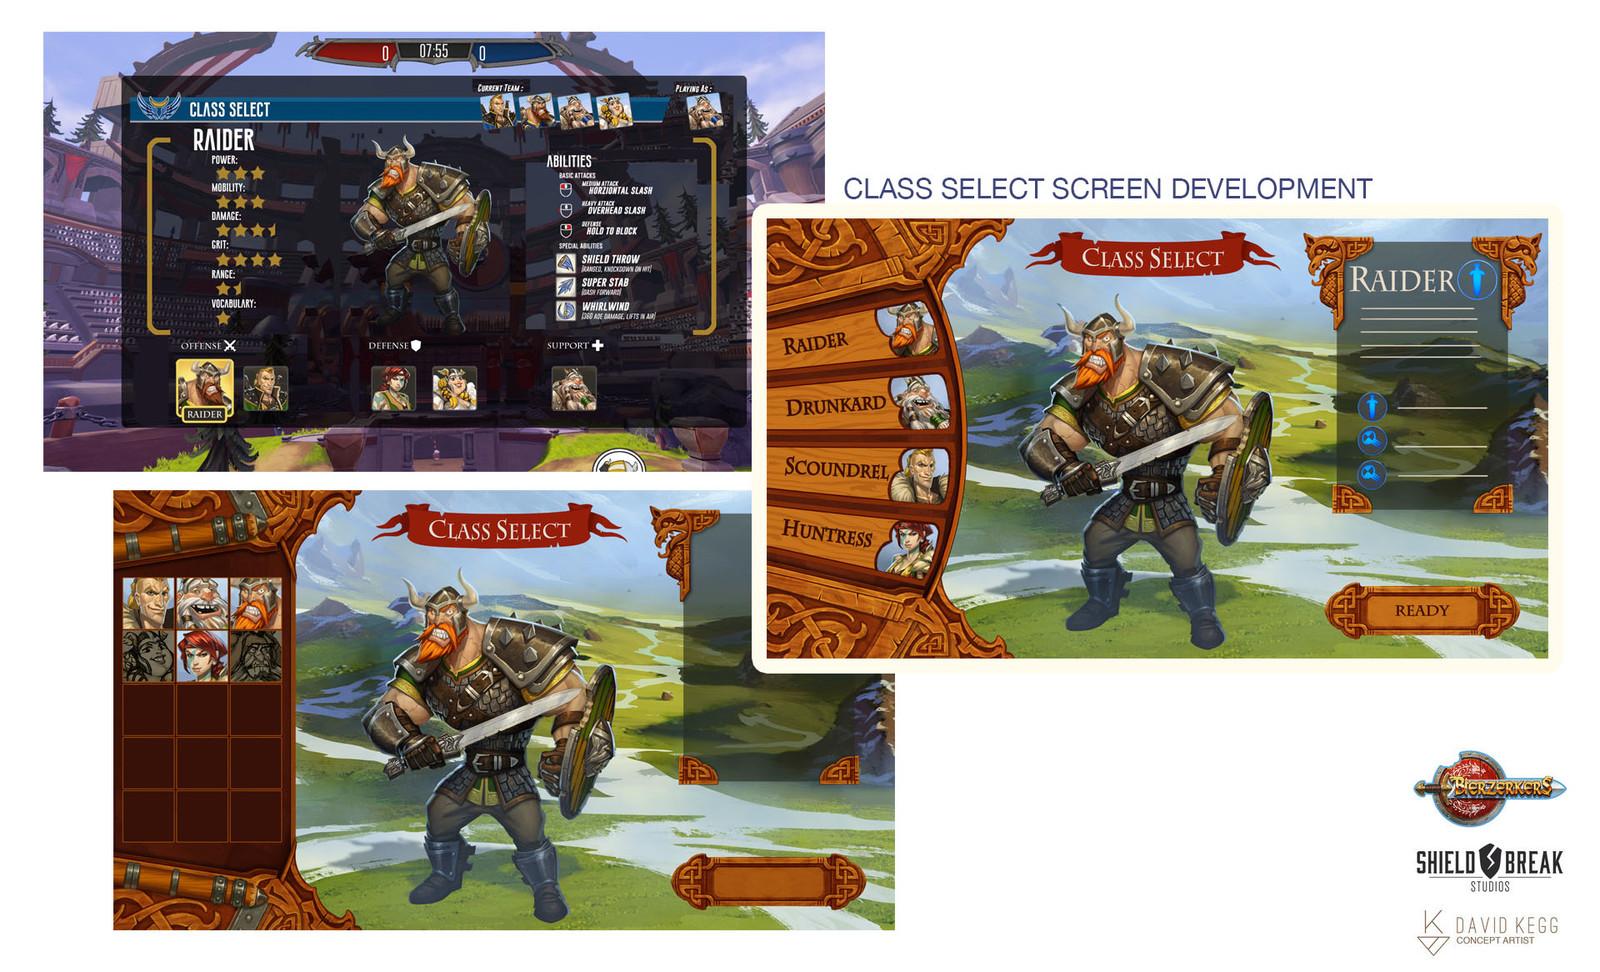 Class Select Screens